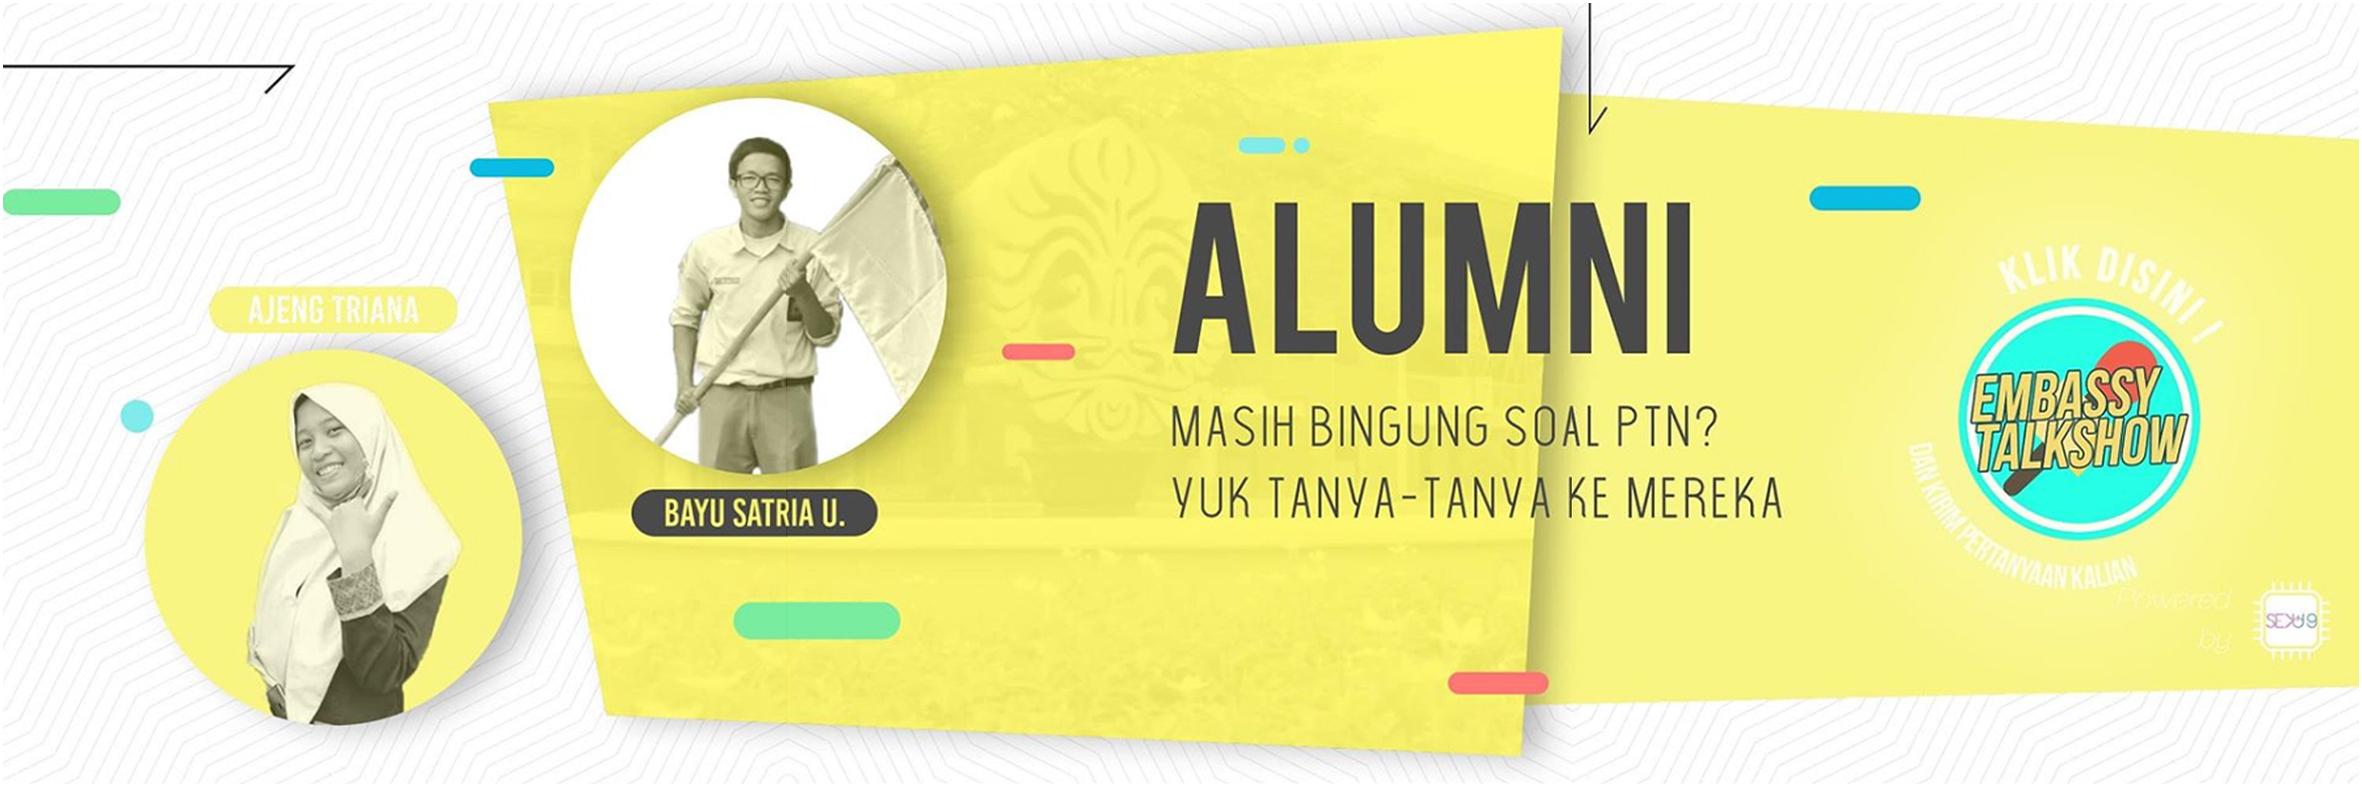 Embassy Talkshow dari Alumni SMAN 4 Bekasi